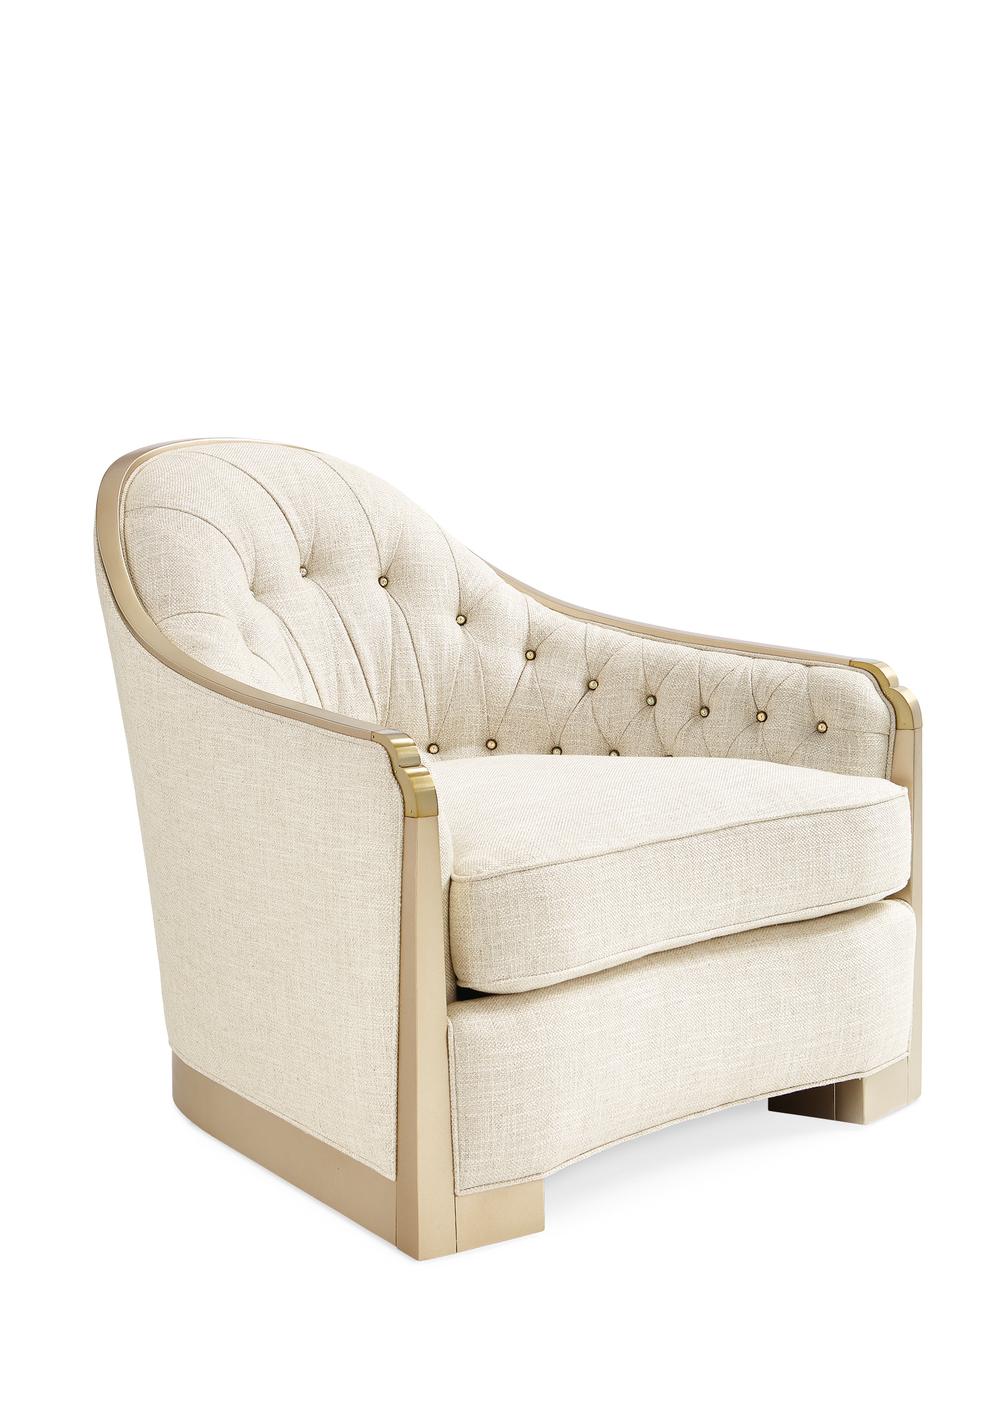 Caracole - She's A Charmer Chair